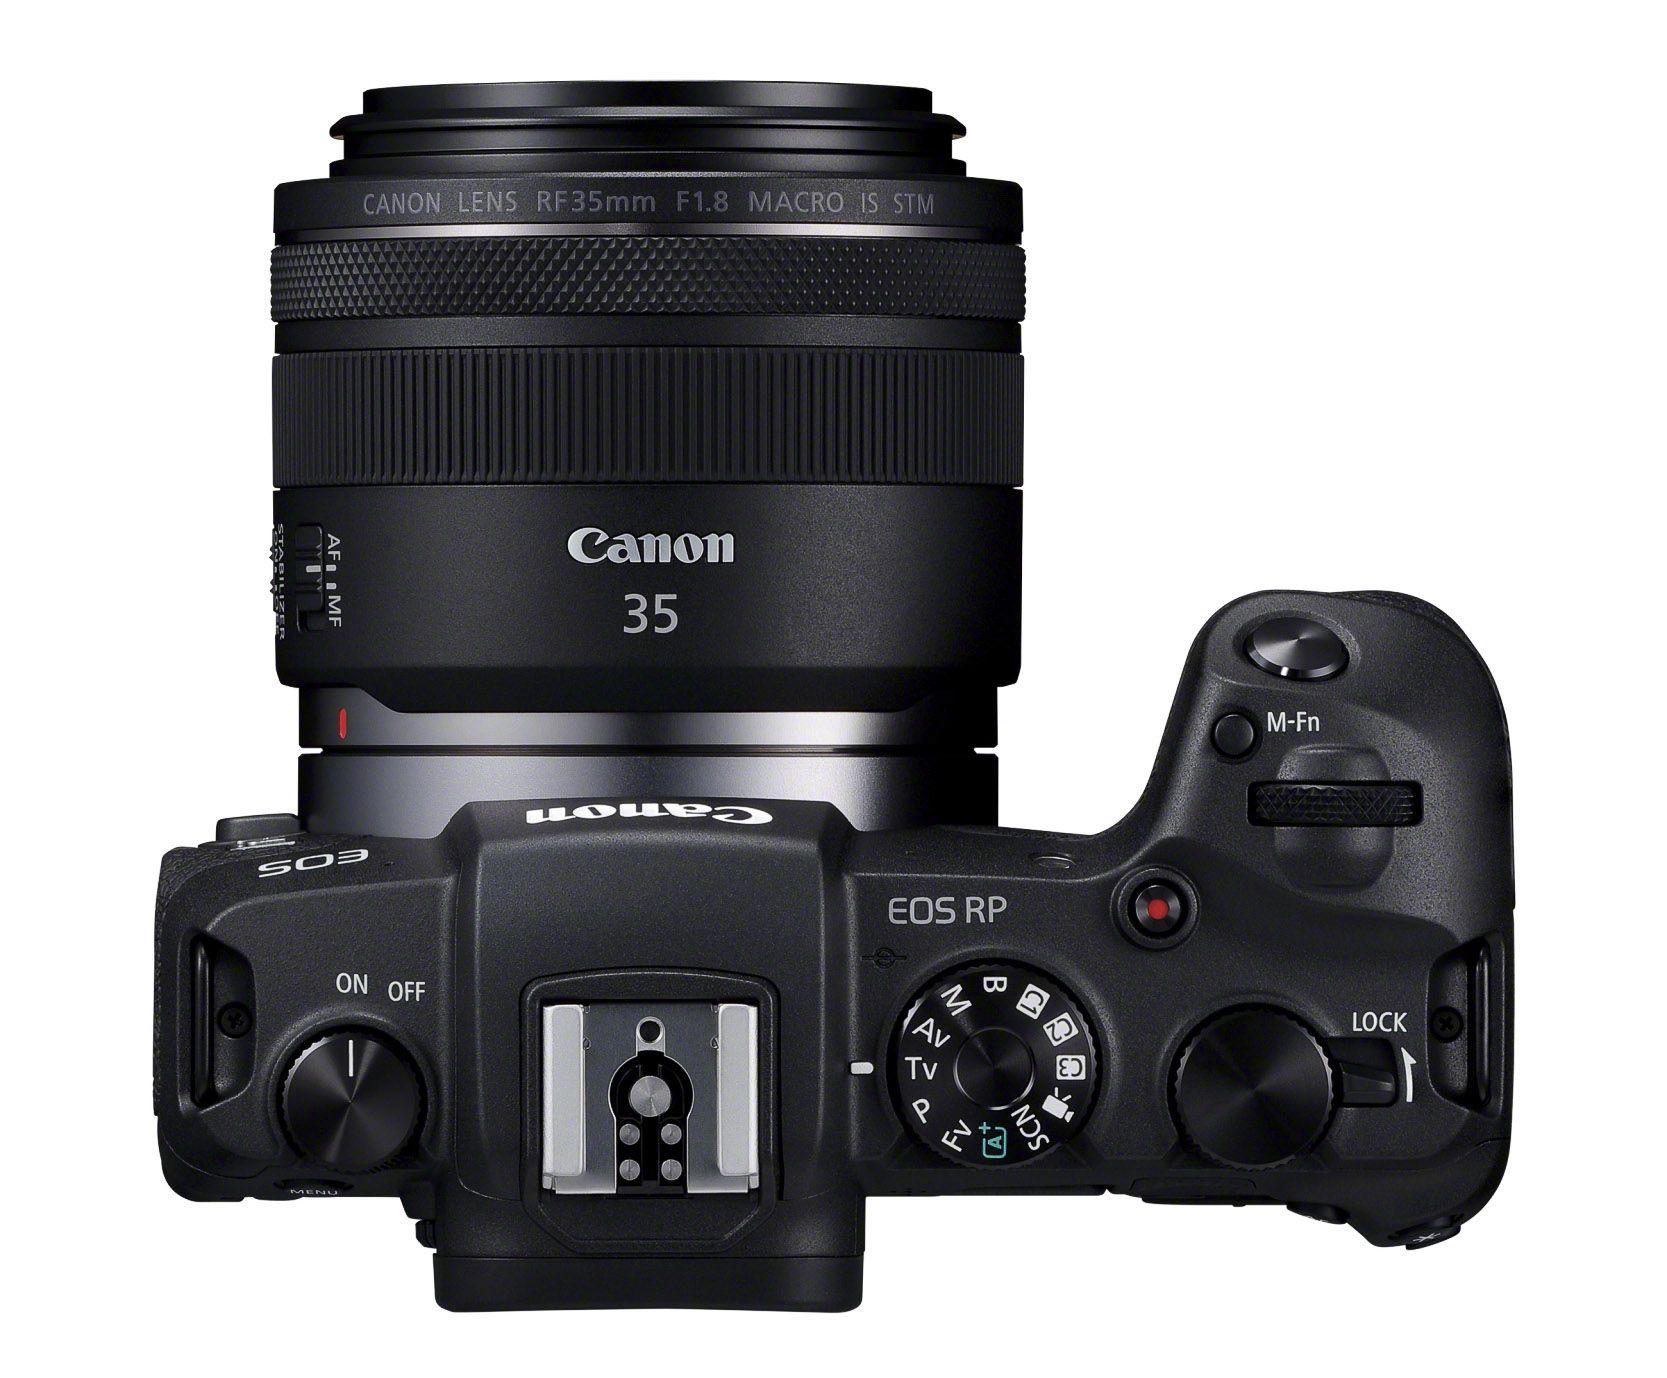 Canon Rf 35mm F 1 8 Is Macro Stm Lens Review Canon Camera Camera Nikon Camera Lens